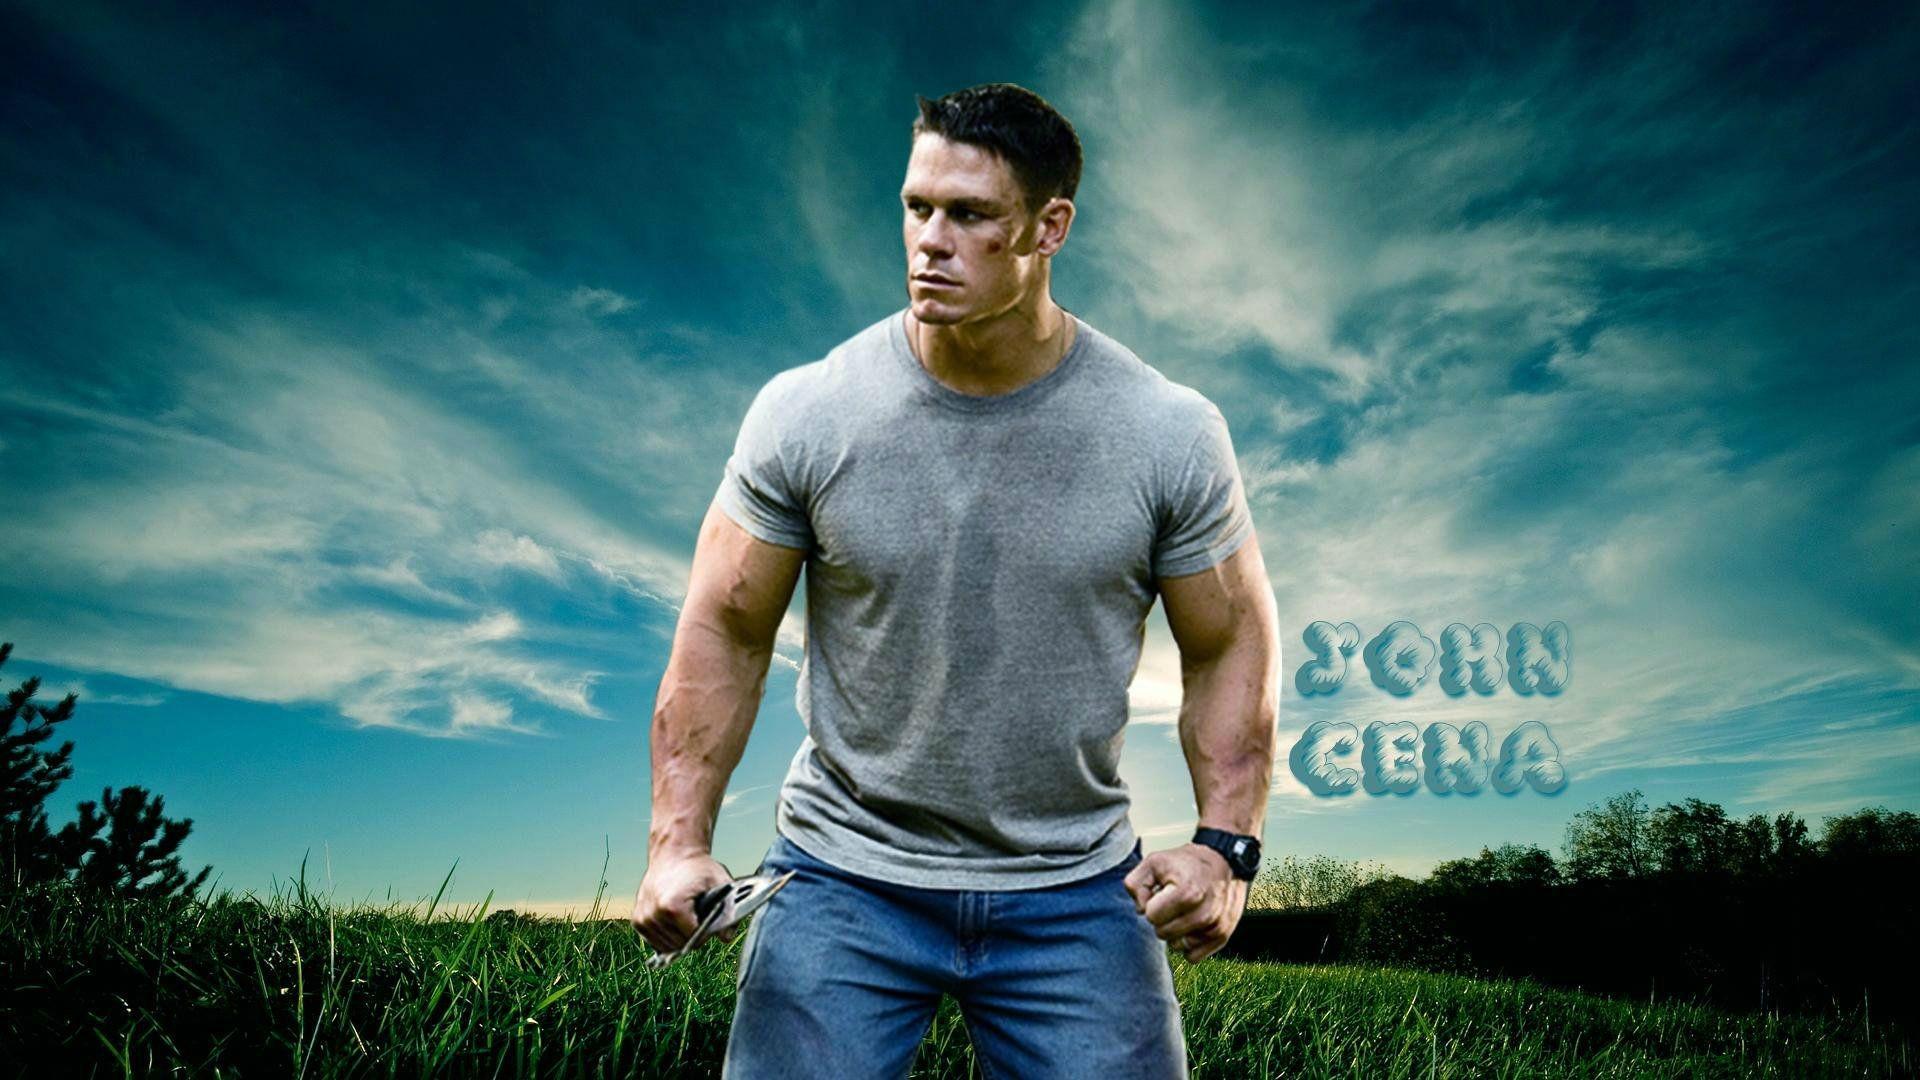 John Cena WWE HD Wallpapers